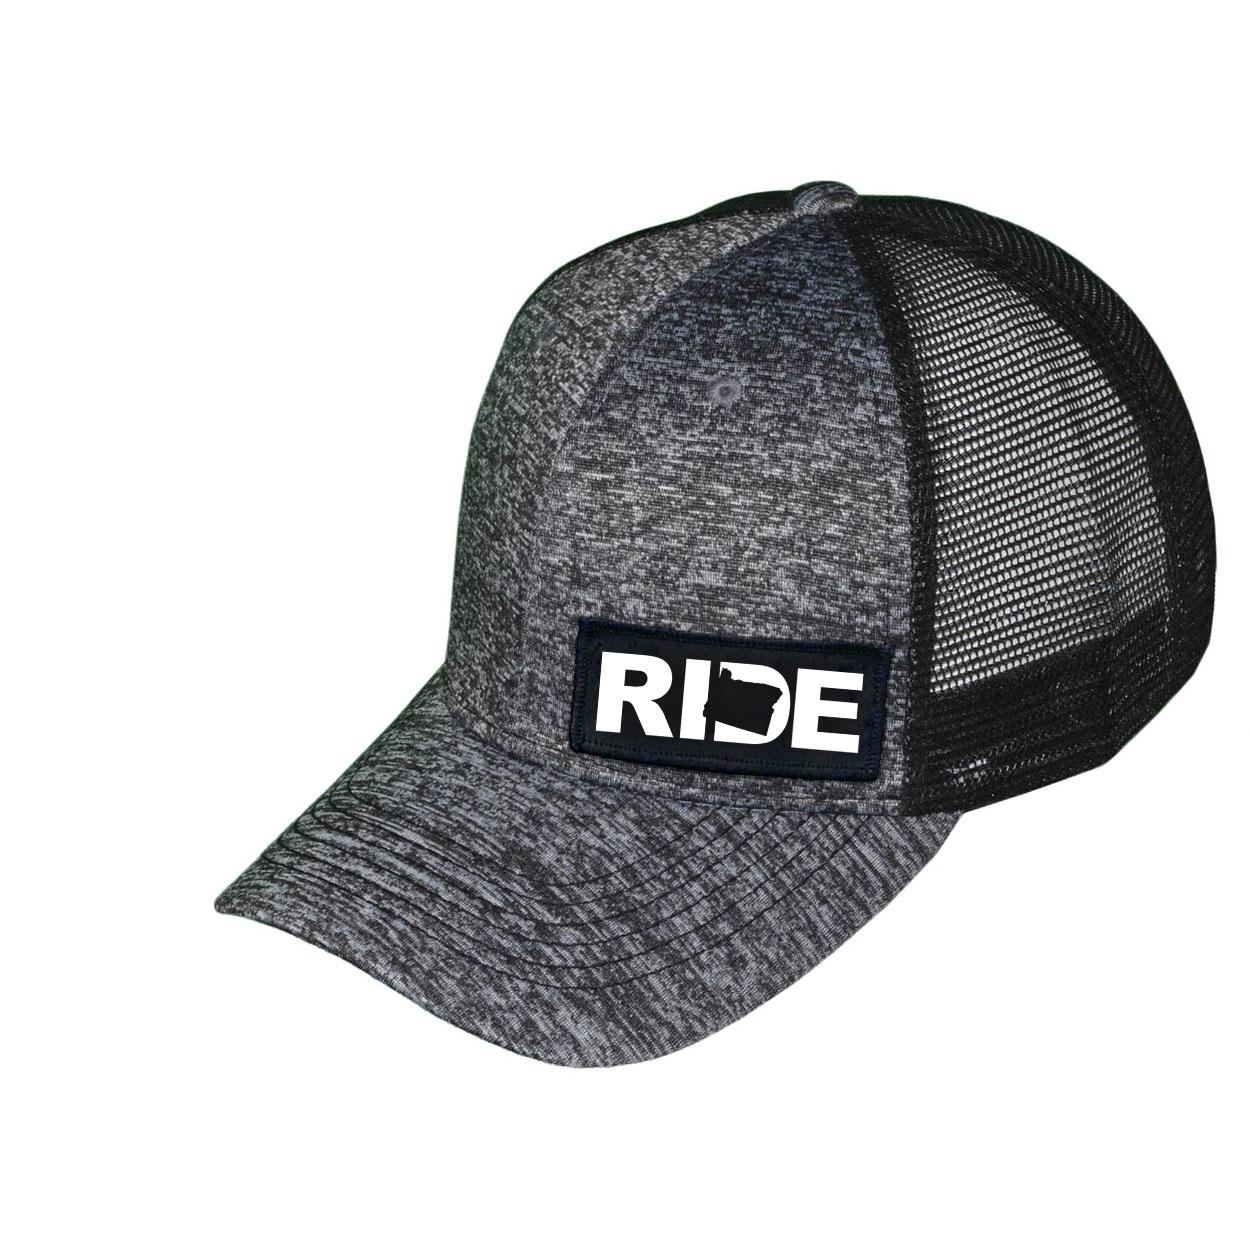 Ride Oregon Night Out Woven Patch Melange Snapback Trucker Hat Gray/Black (White Logo)